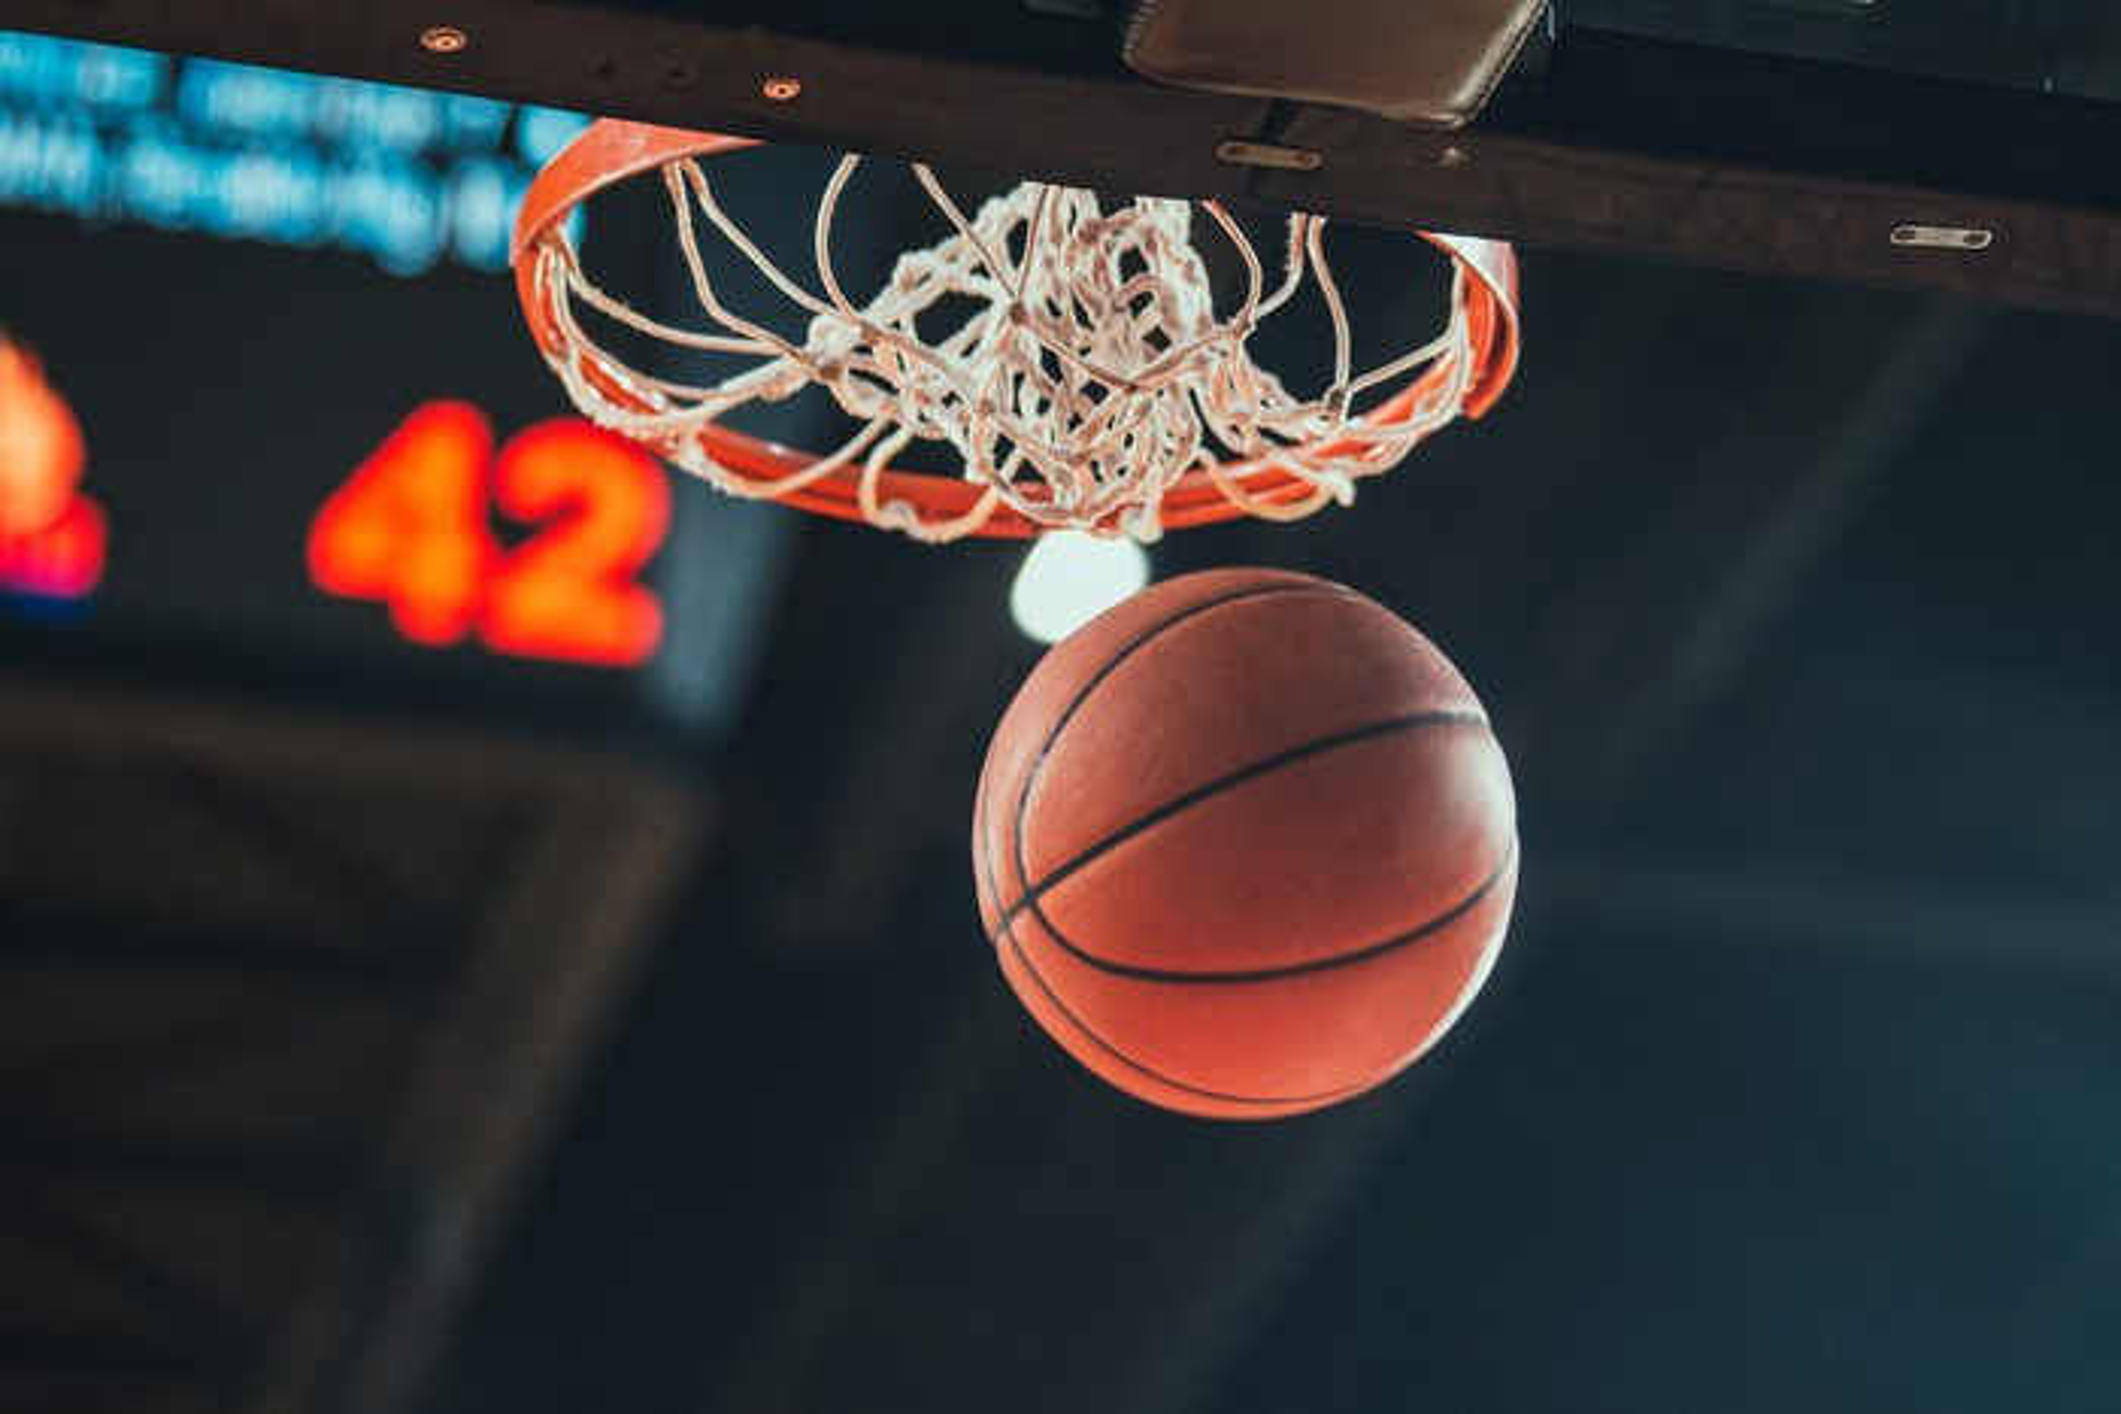 A basketball swishing through the hoop